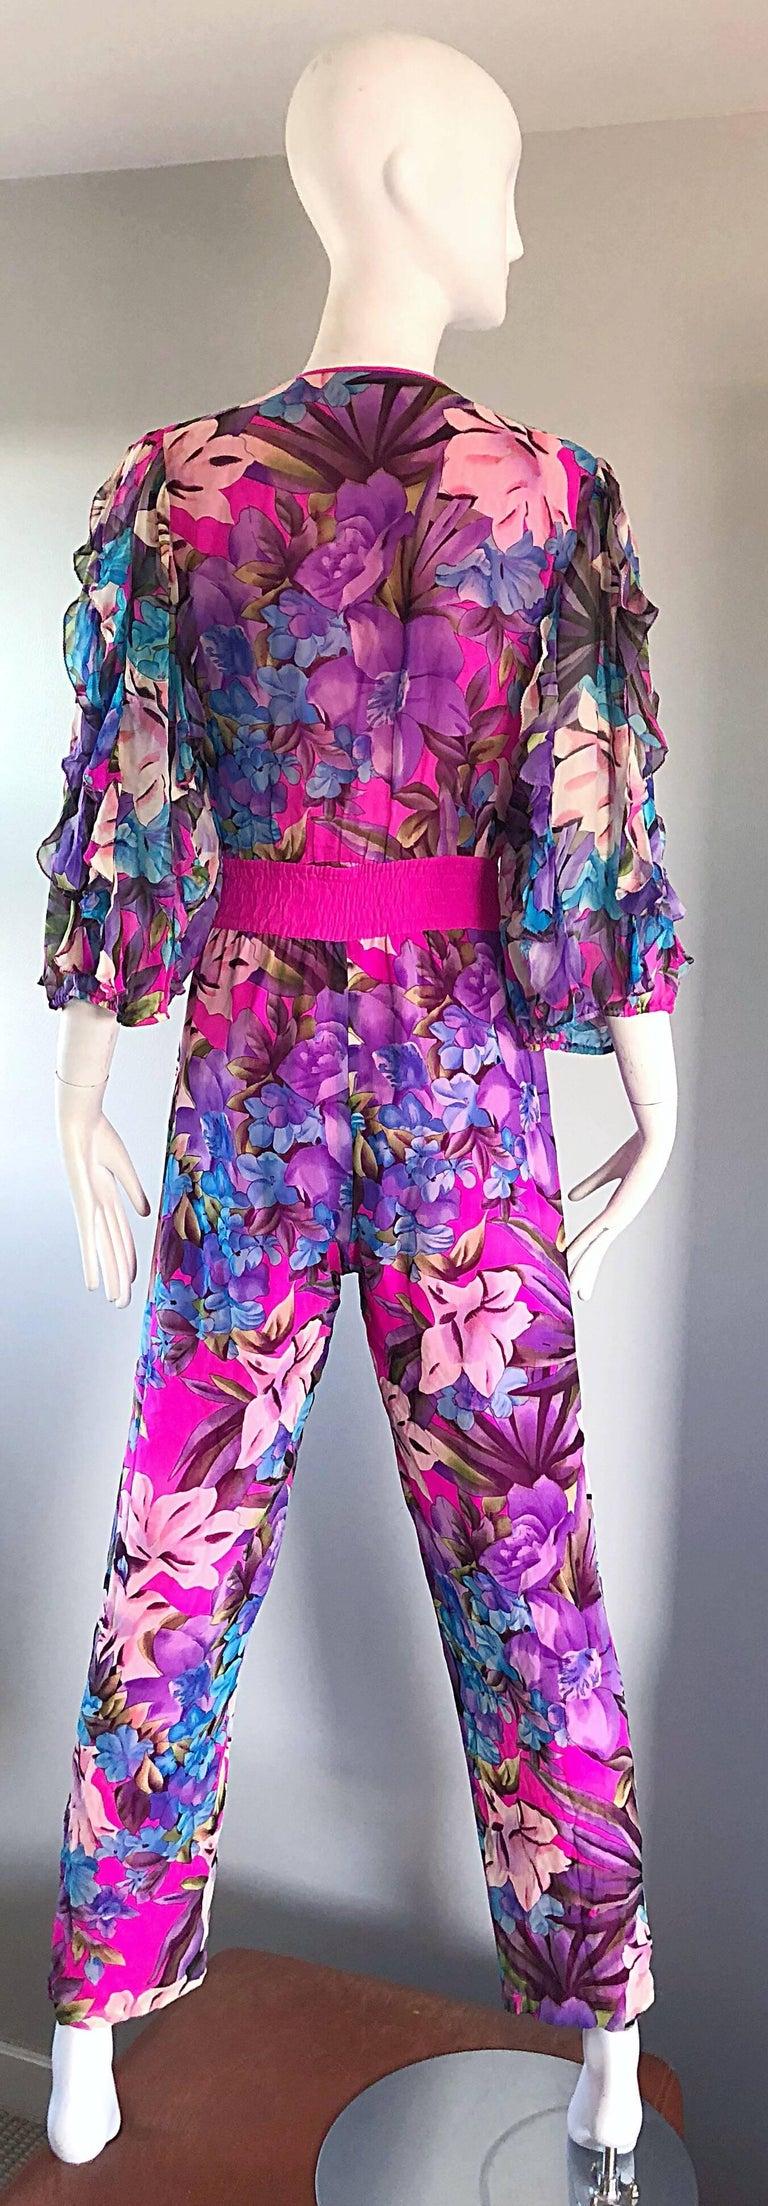 Amazing Vintage Diane Freis Silk Chiffon Beaded Pink Jumpsuit & Head Scarf Sash  For Sale 2